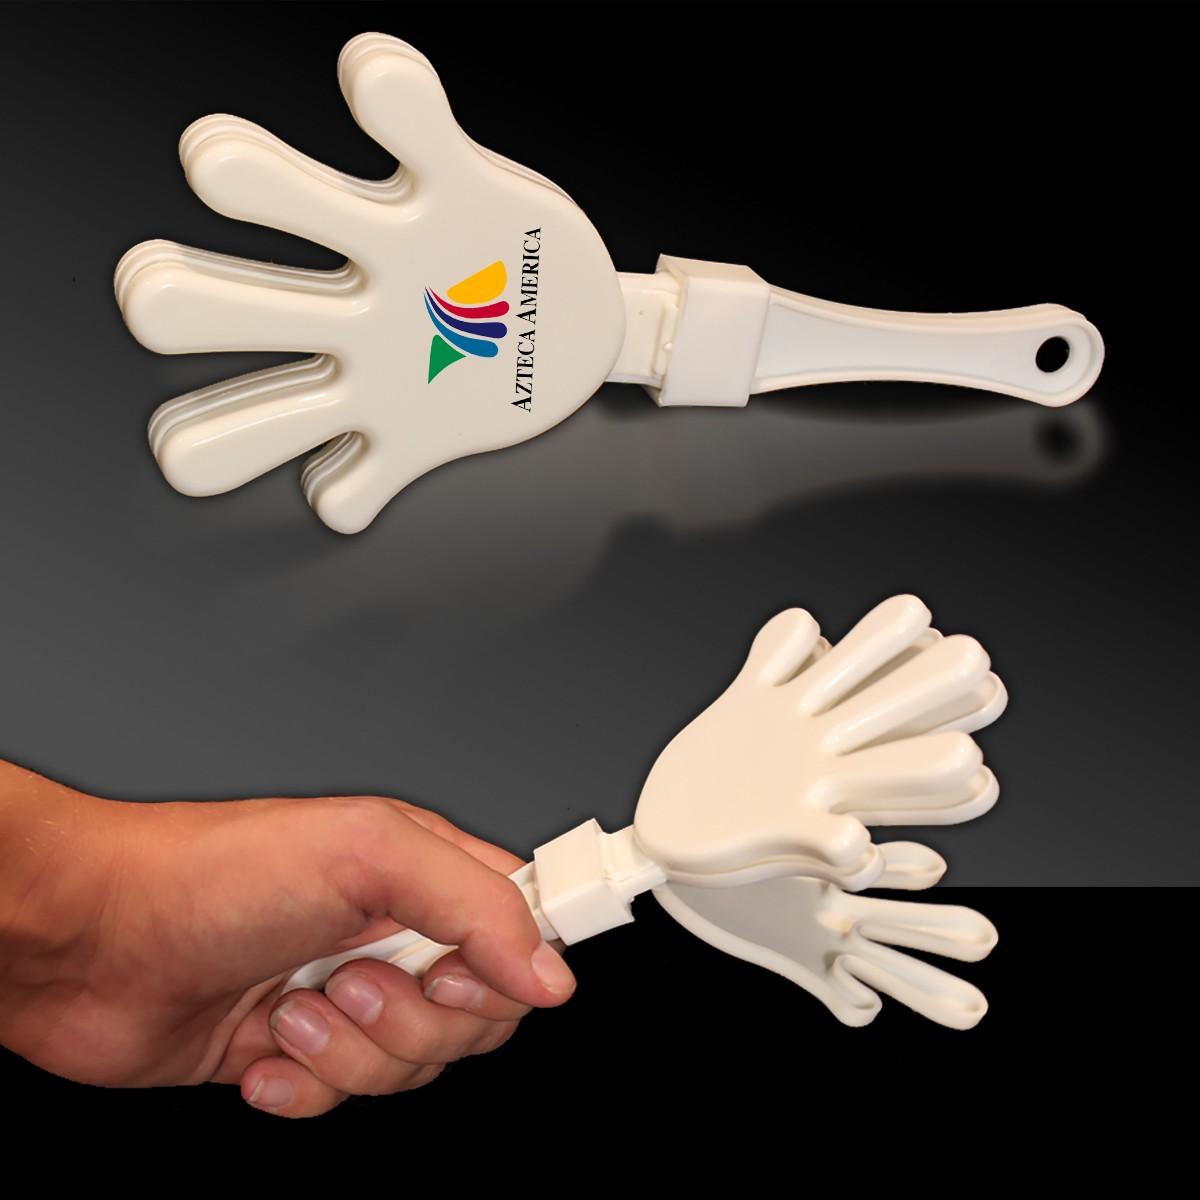 WHITEWHITEWHITE HAND CLAPPER